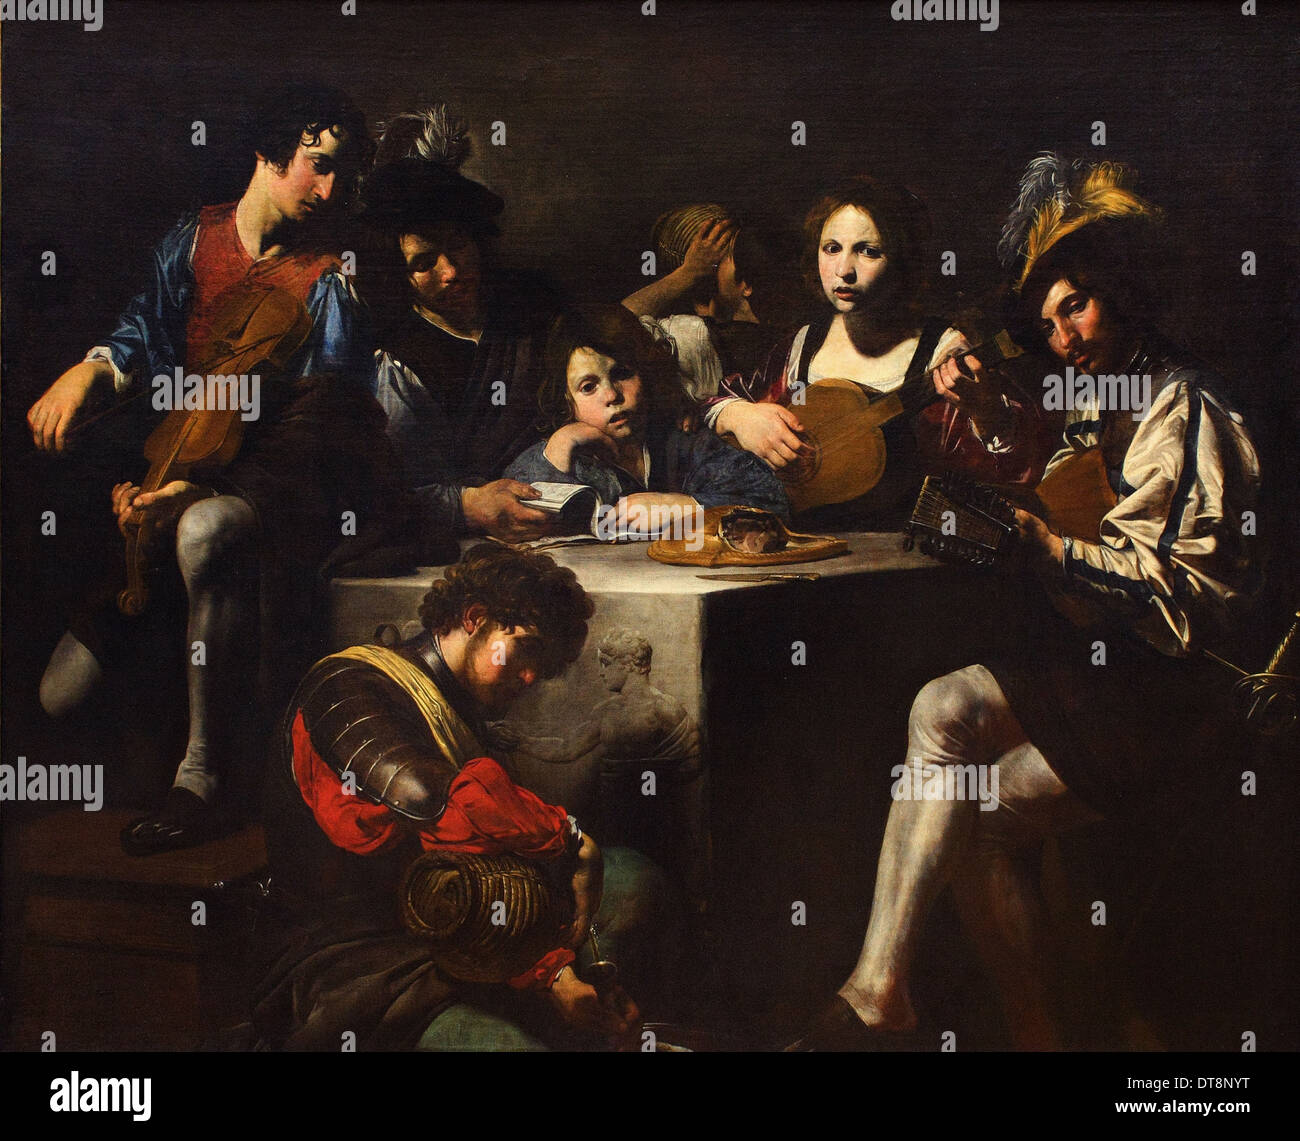 Valentin de Boulogne aka Valentin - The Concert in bas-relief - circa 1622 - 1625- Louvre Museum - Paris - Stock Image